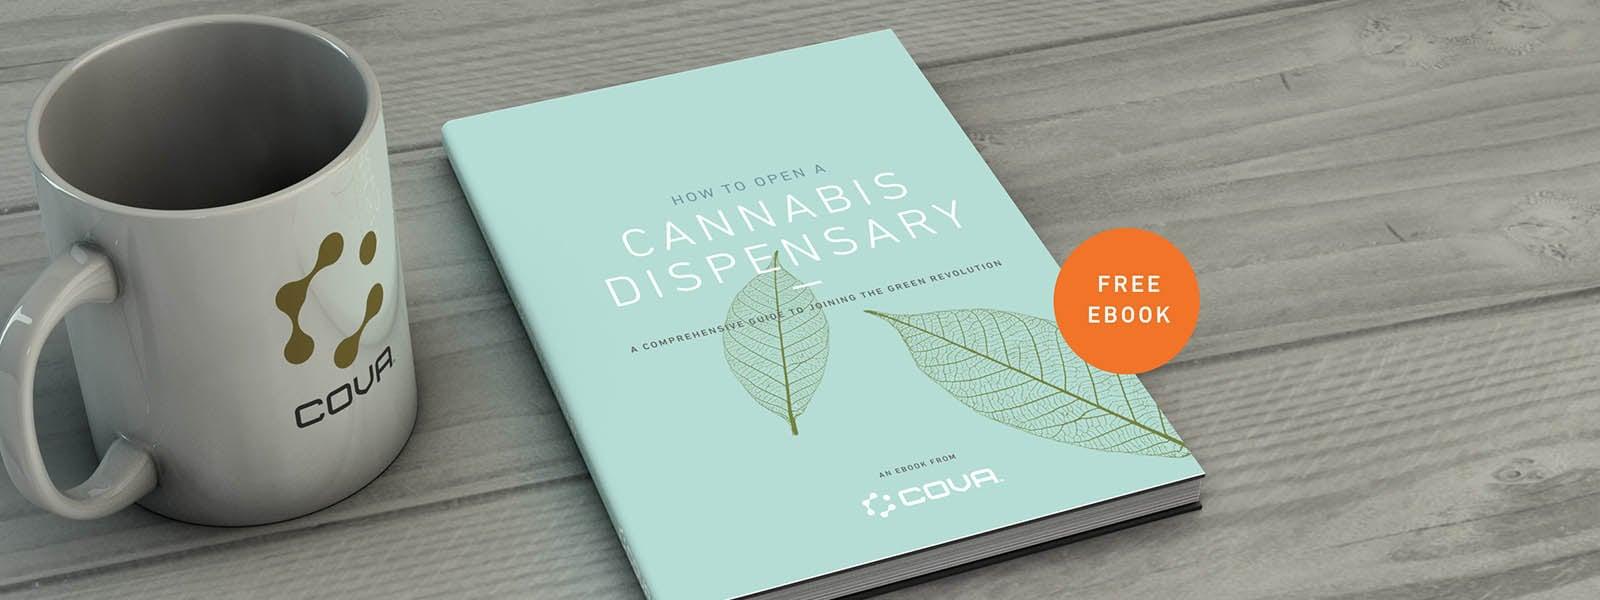 cannabis-dispensary-ebook-hero